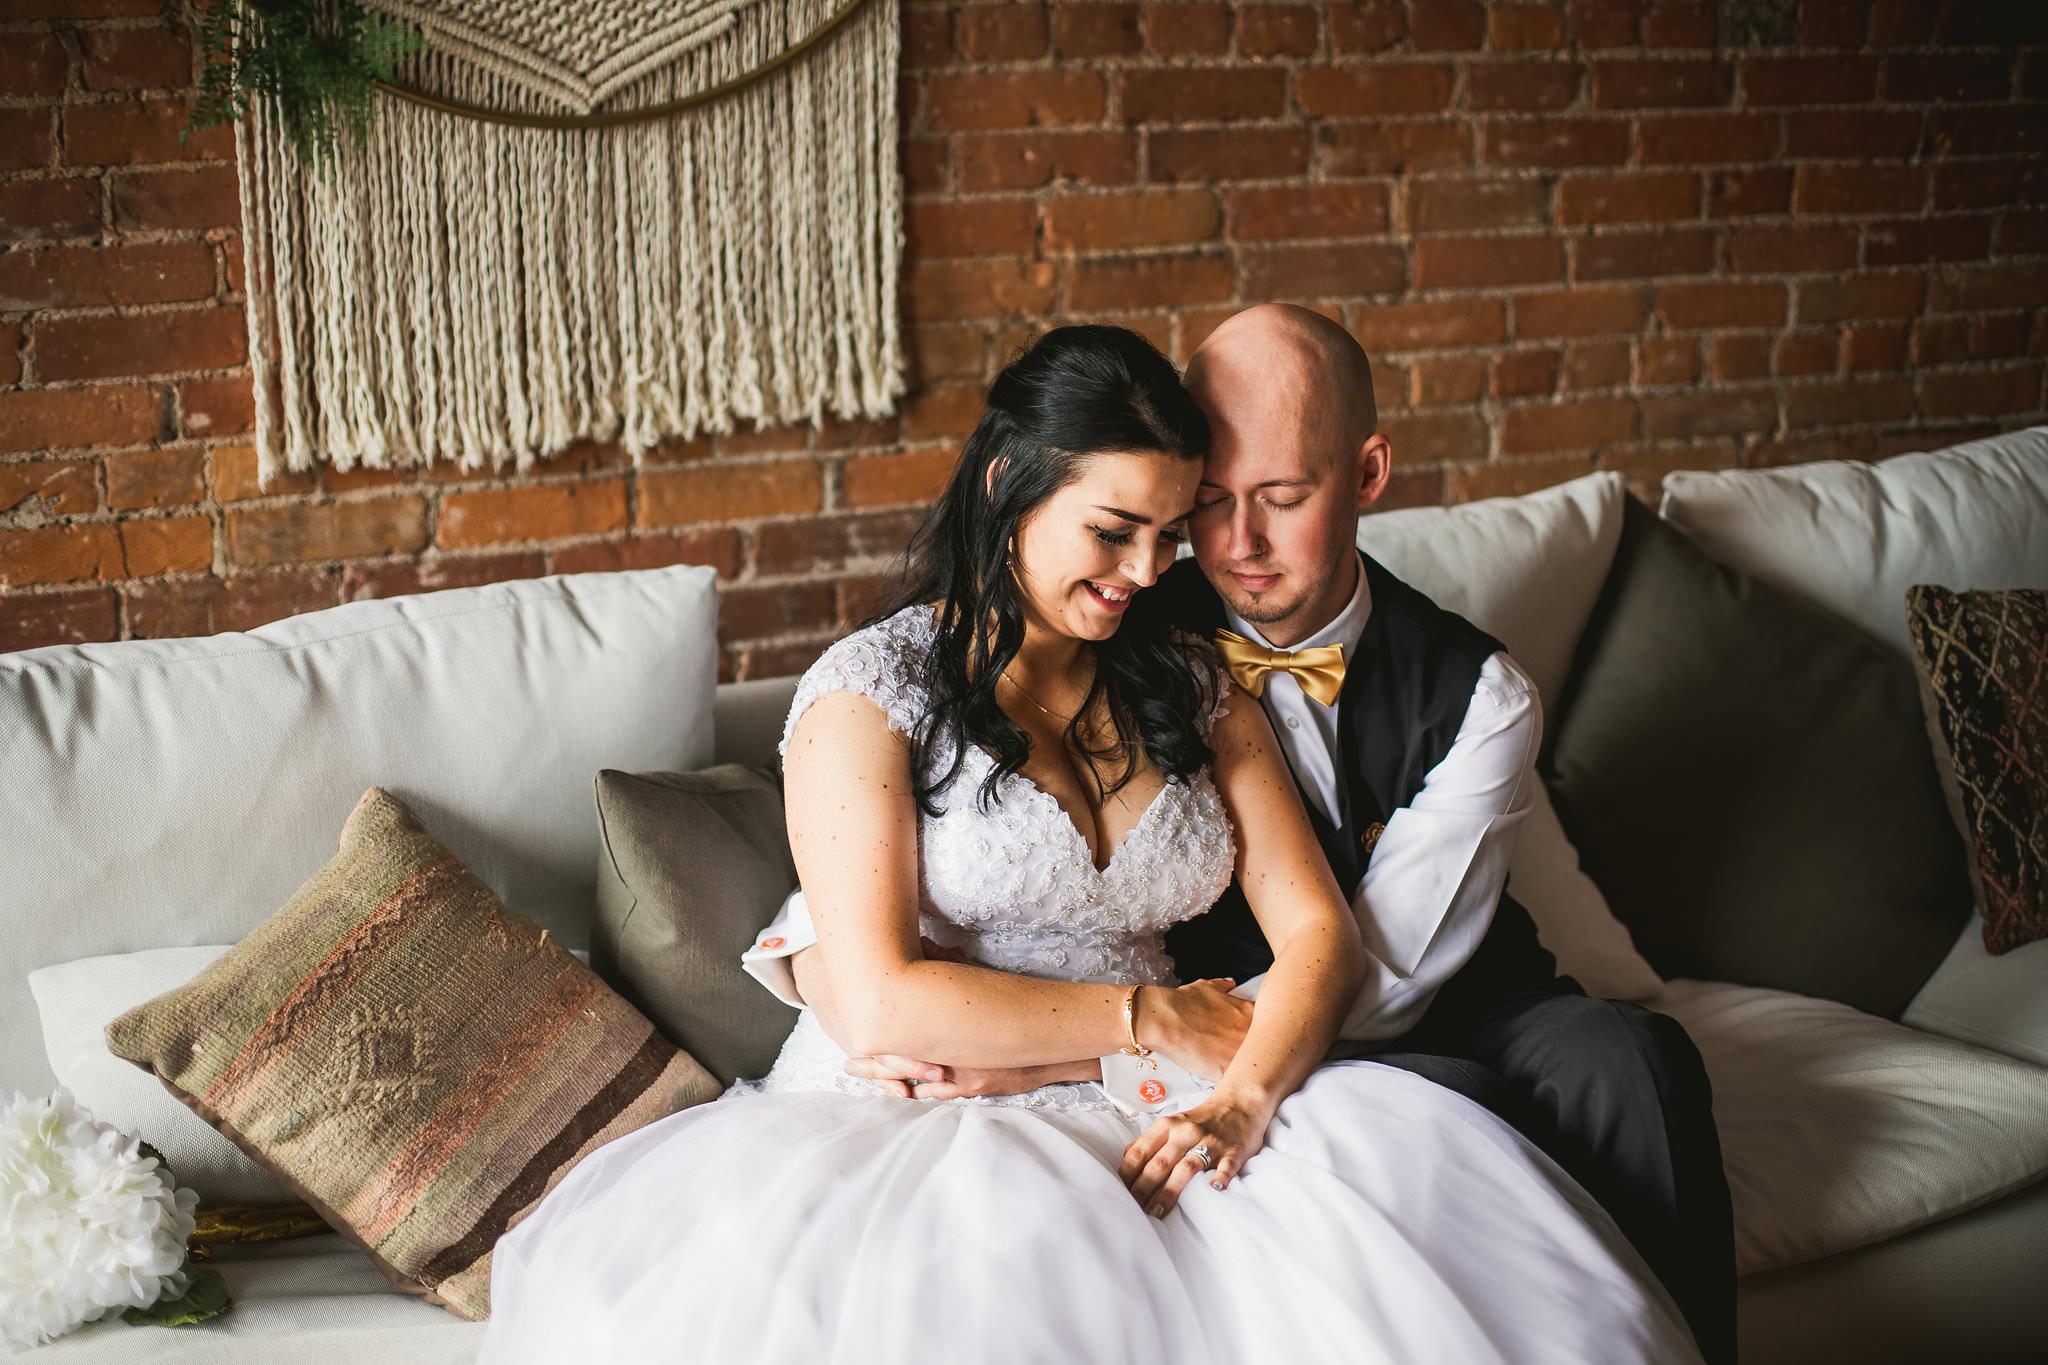 Kristen Adam Kindred Loft Whitby Wedding Photos 312 - Durham Wedding Photographer: Kindred Loft Wedding Photos